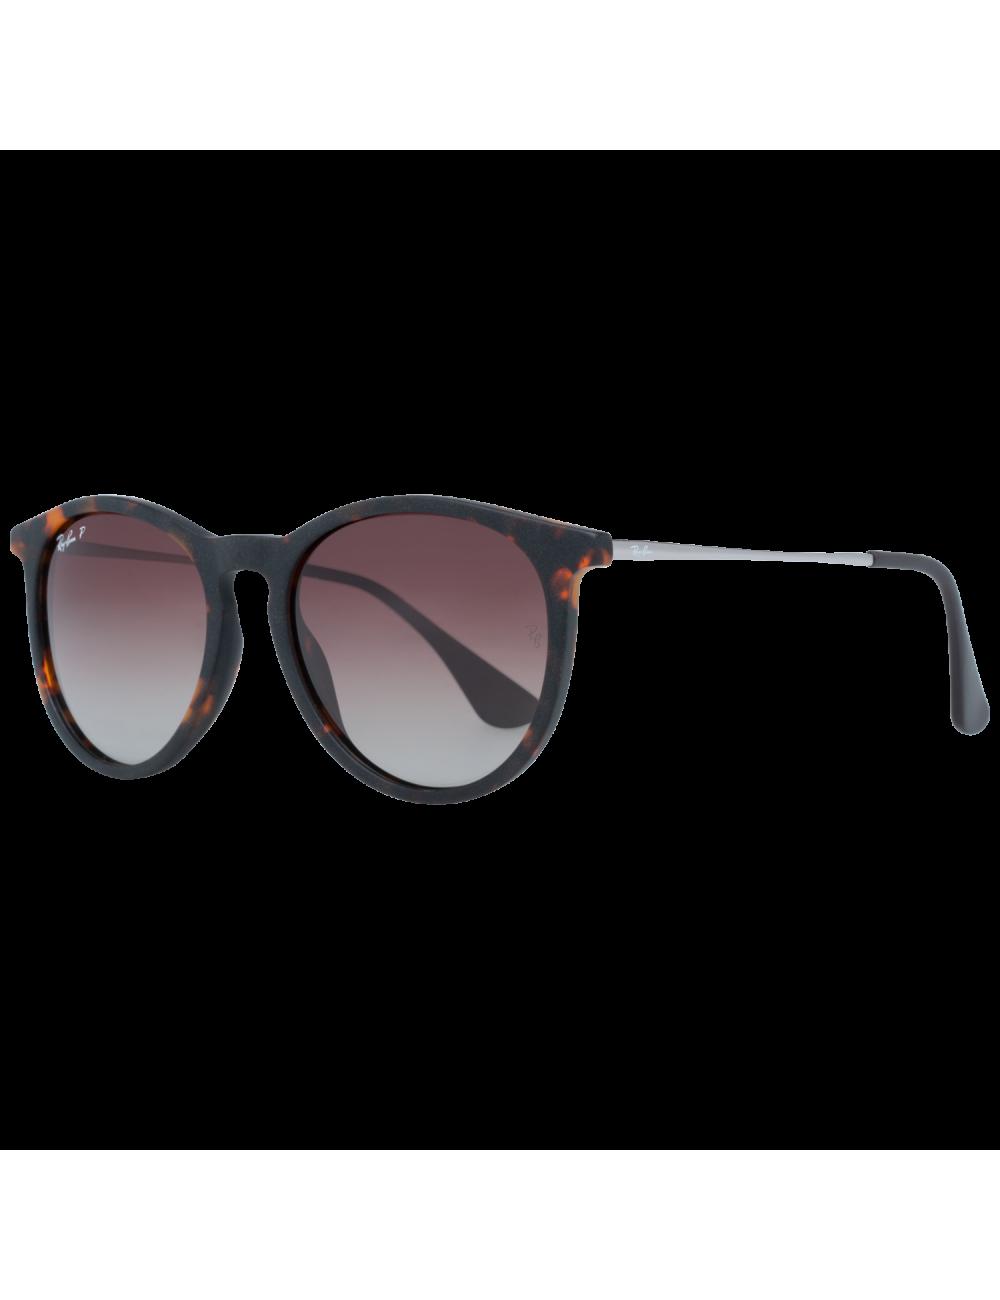 Ray-Ban Sunglasses RB4171F 865/13 54 Erika